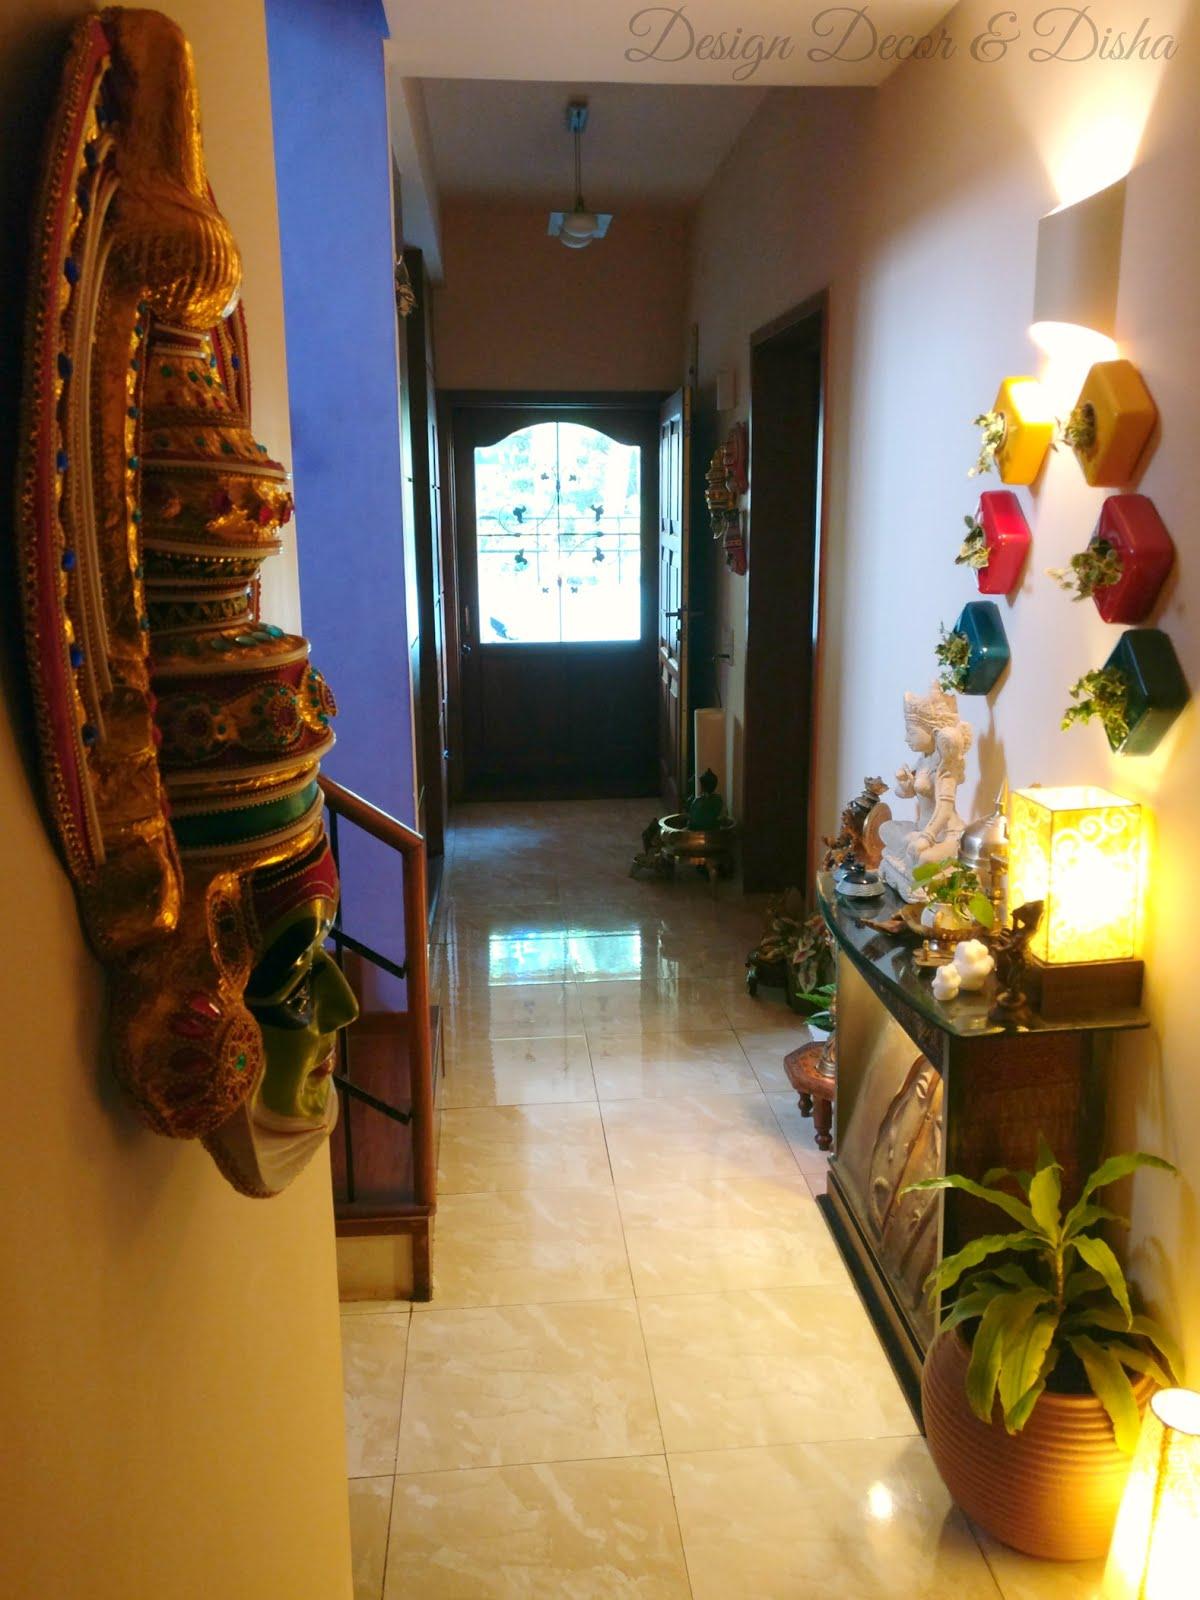 Design decor disha for Indian home decor images